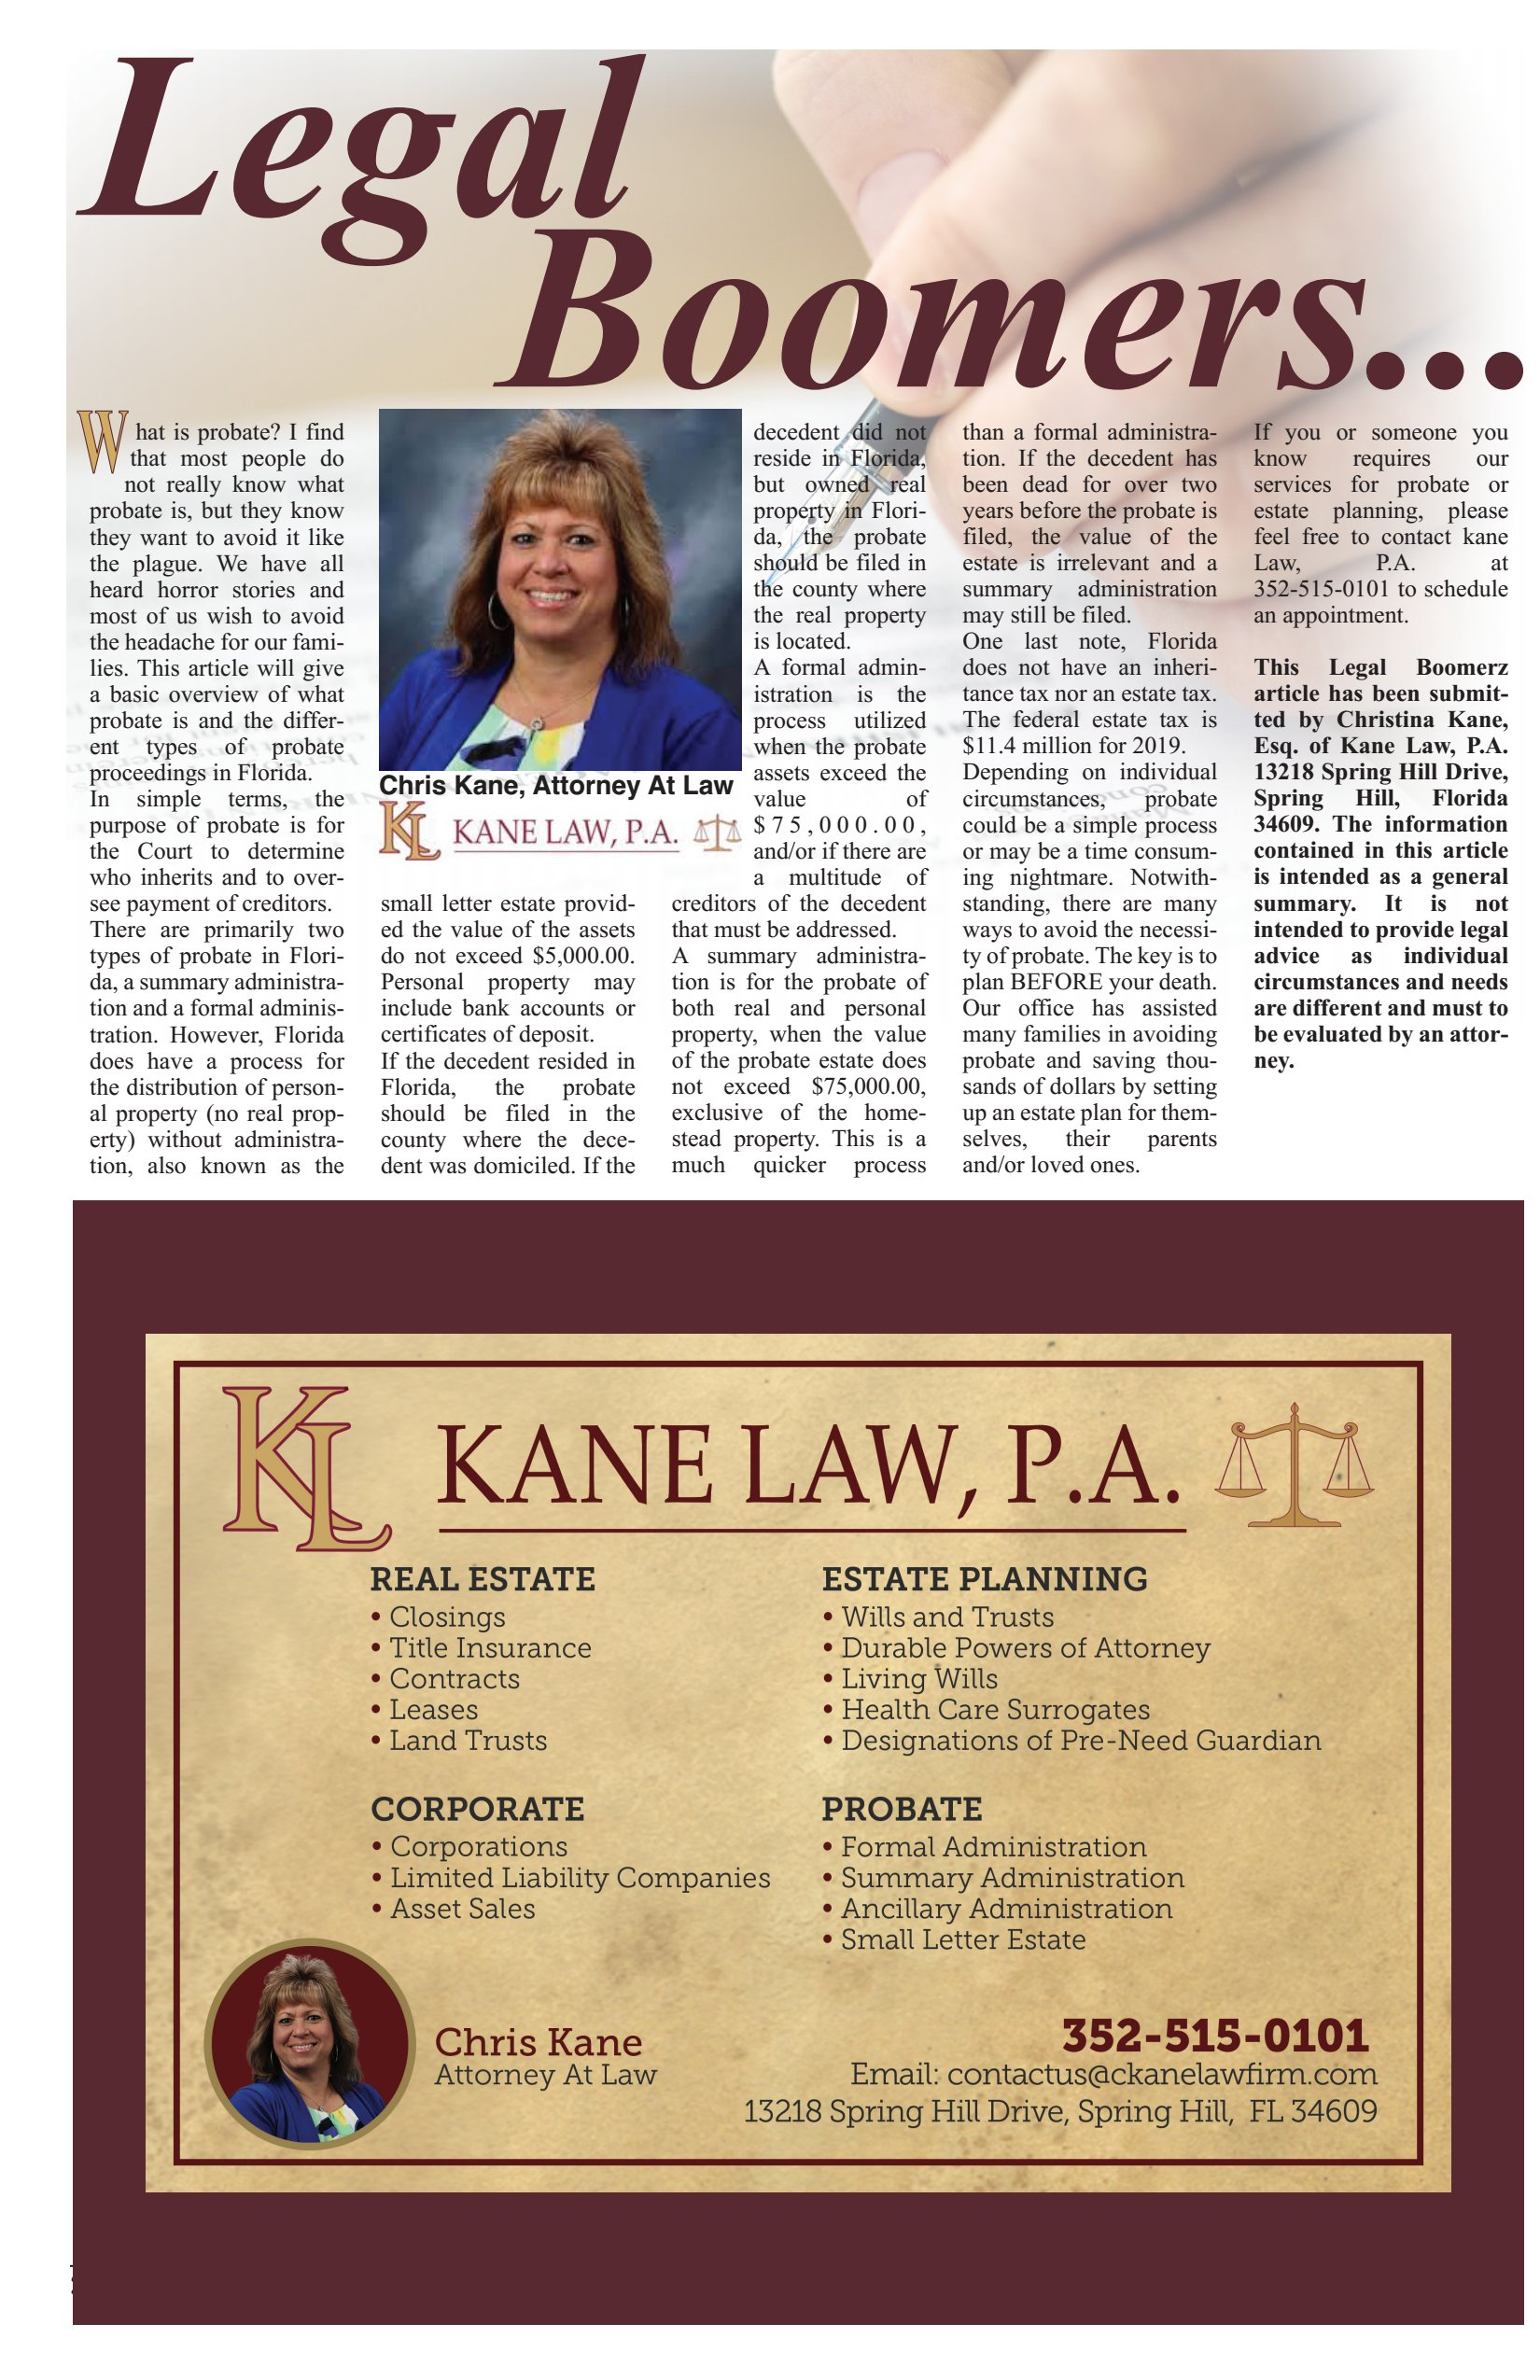 Kane Law